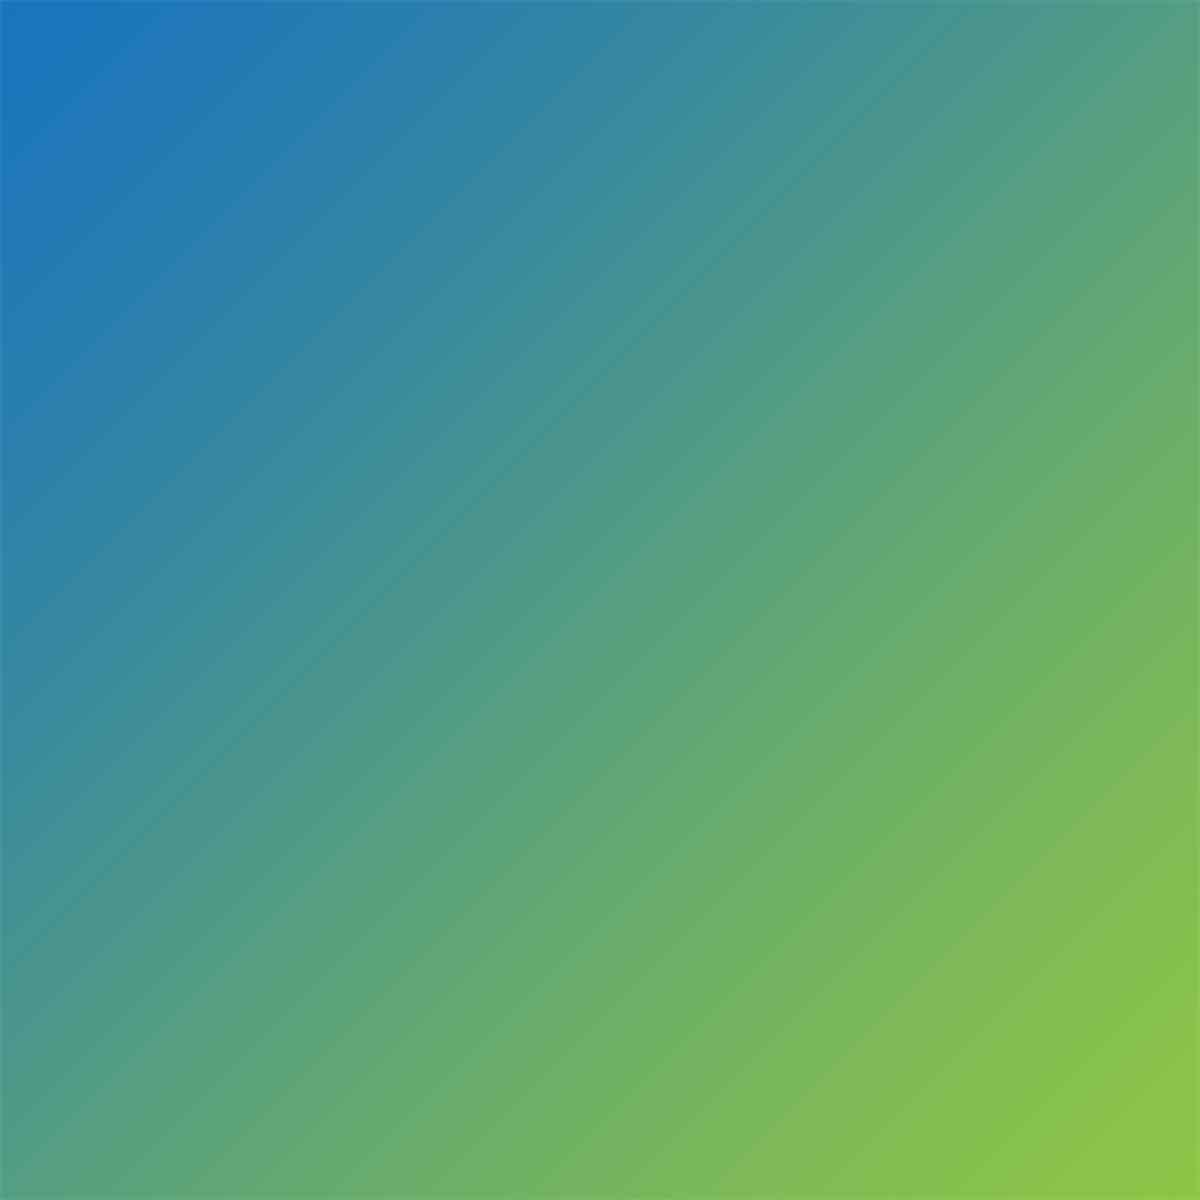 https://www.banitours.com/wp-content/uploads/2018/09/bgn-image-box-gradient.jpg